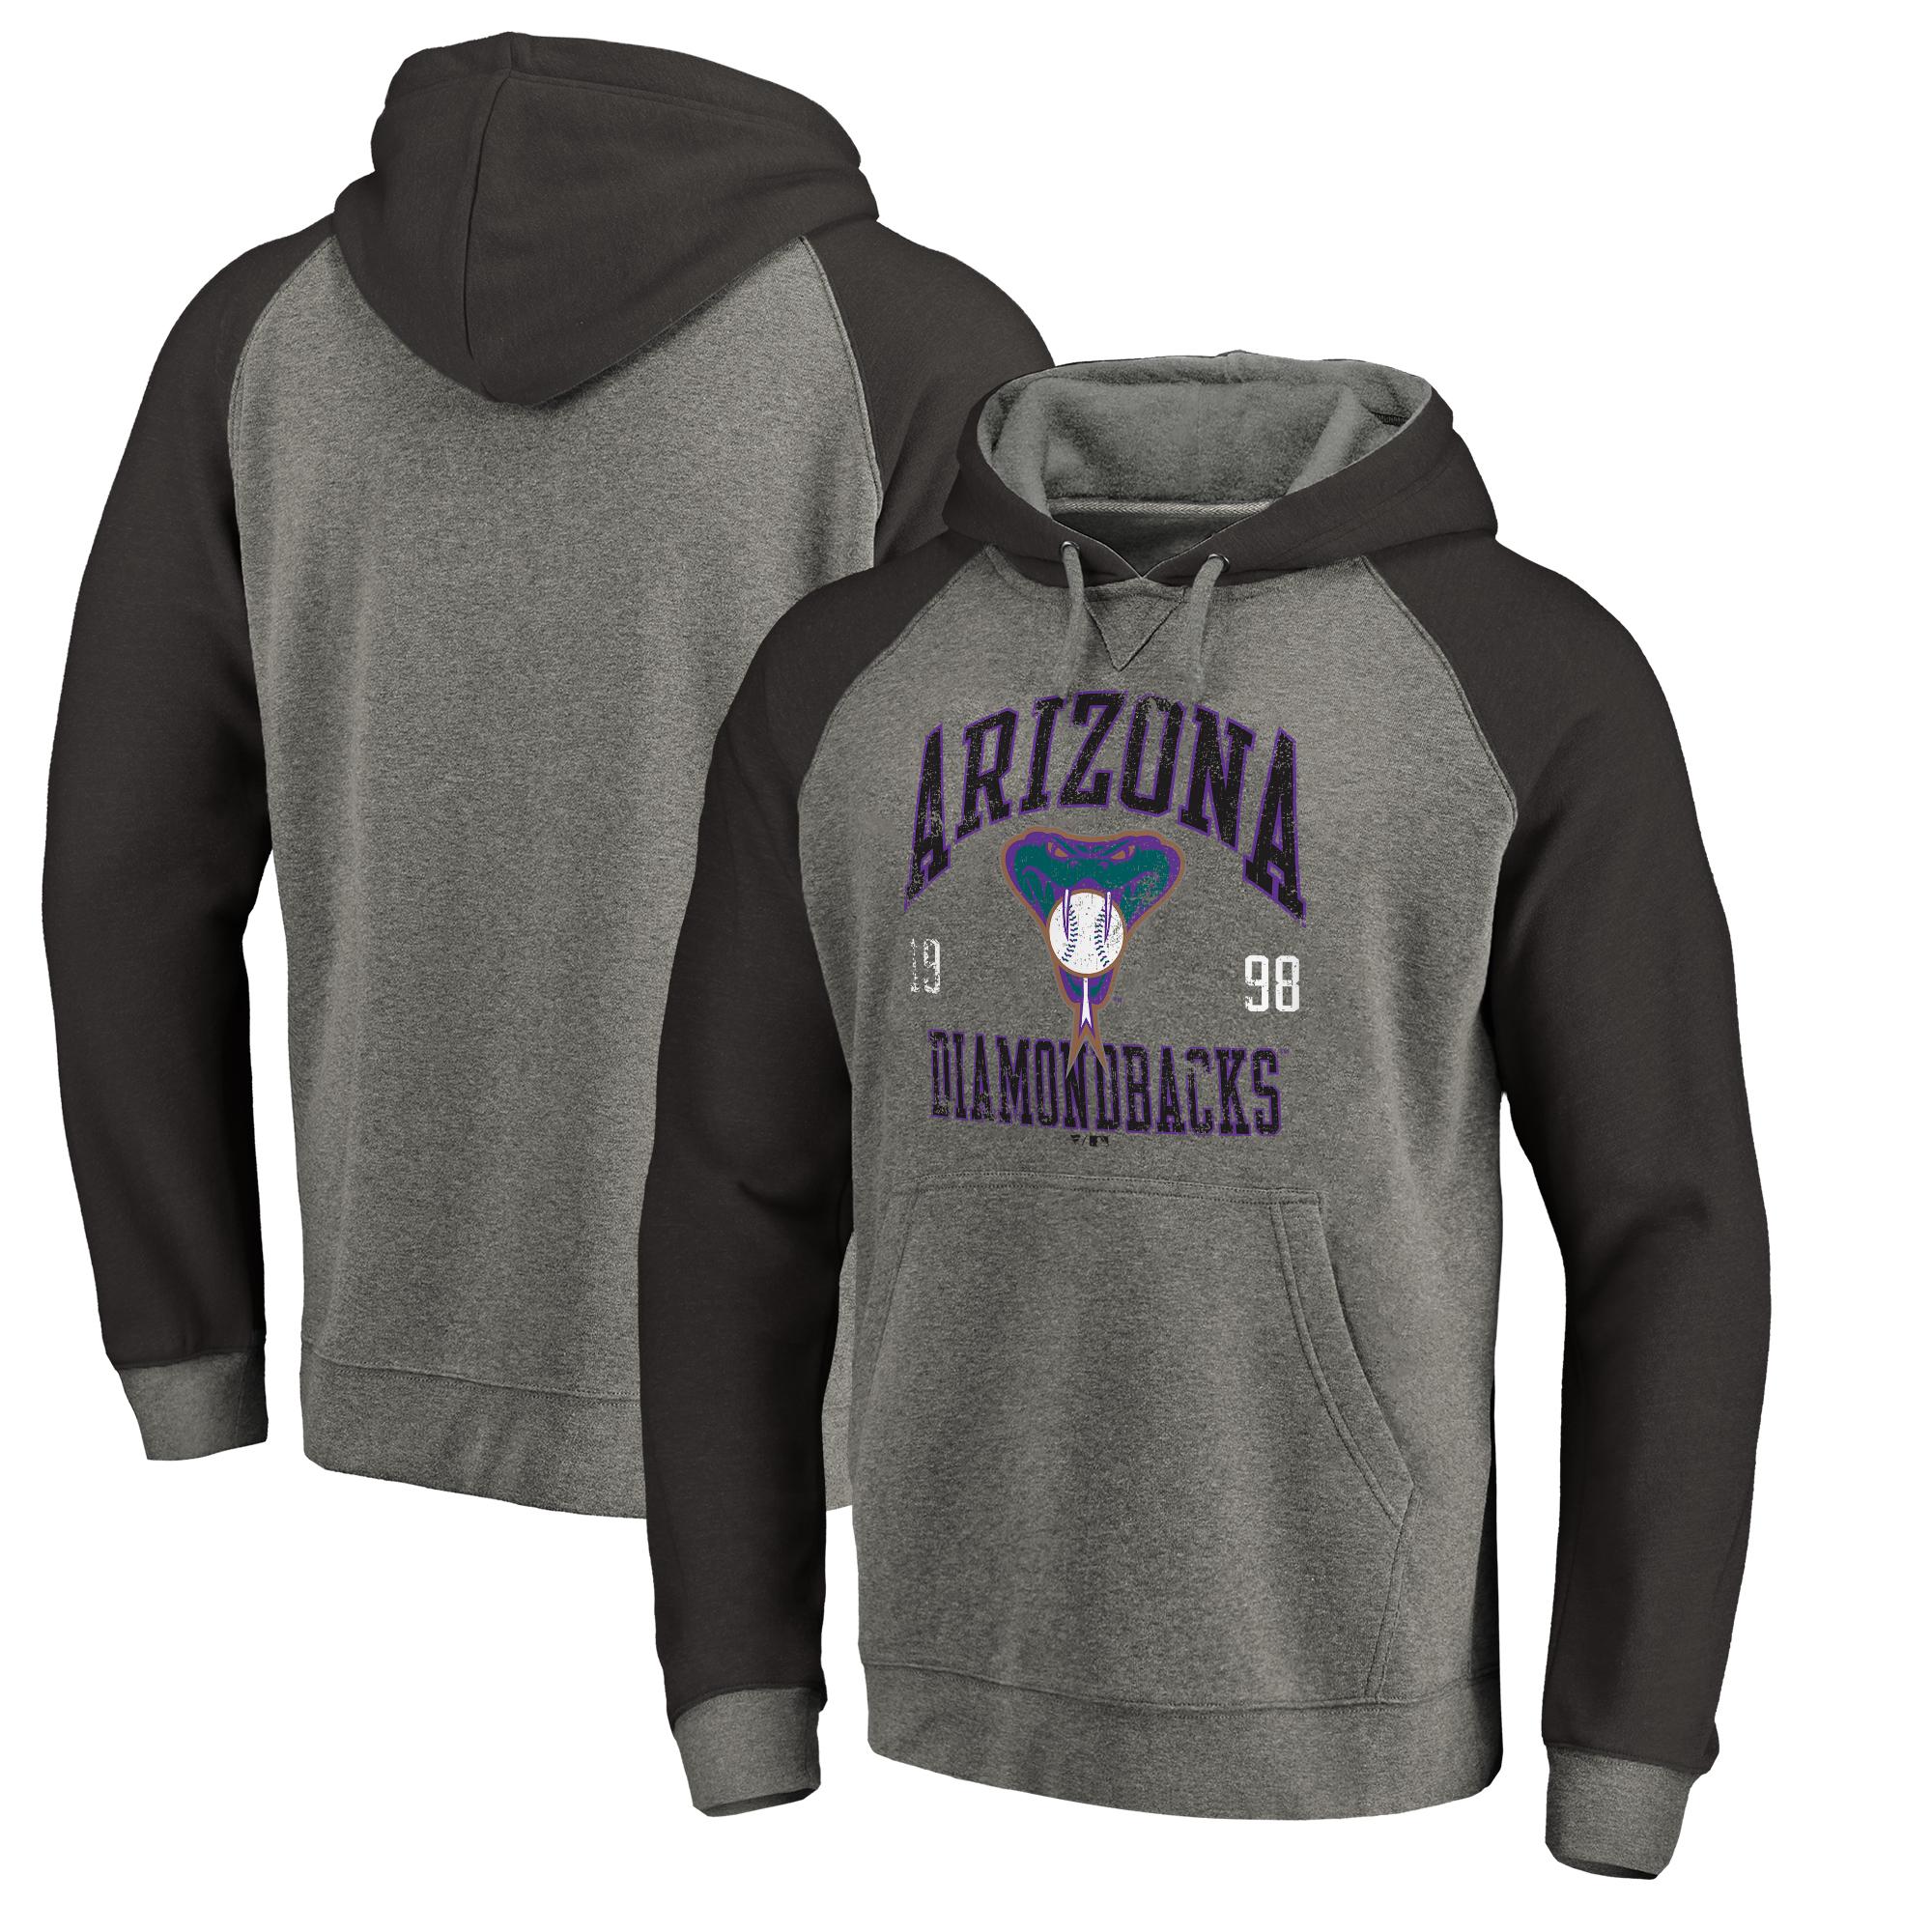 Arizona Diamondbacks Fanatics Branded Cooperstown Collection Old Favorite Tri-Blend Raglan Pullover Hoodie - Ash